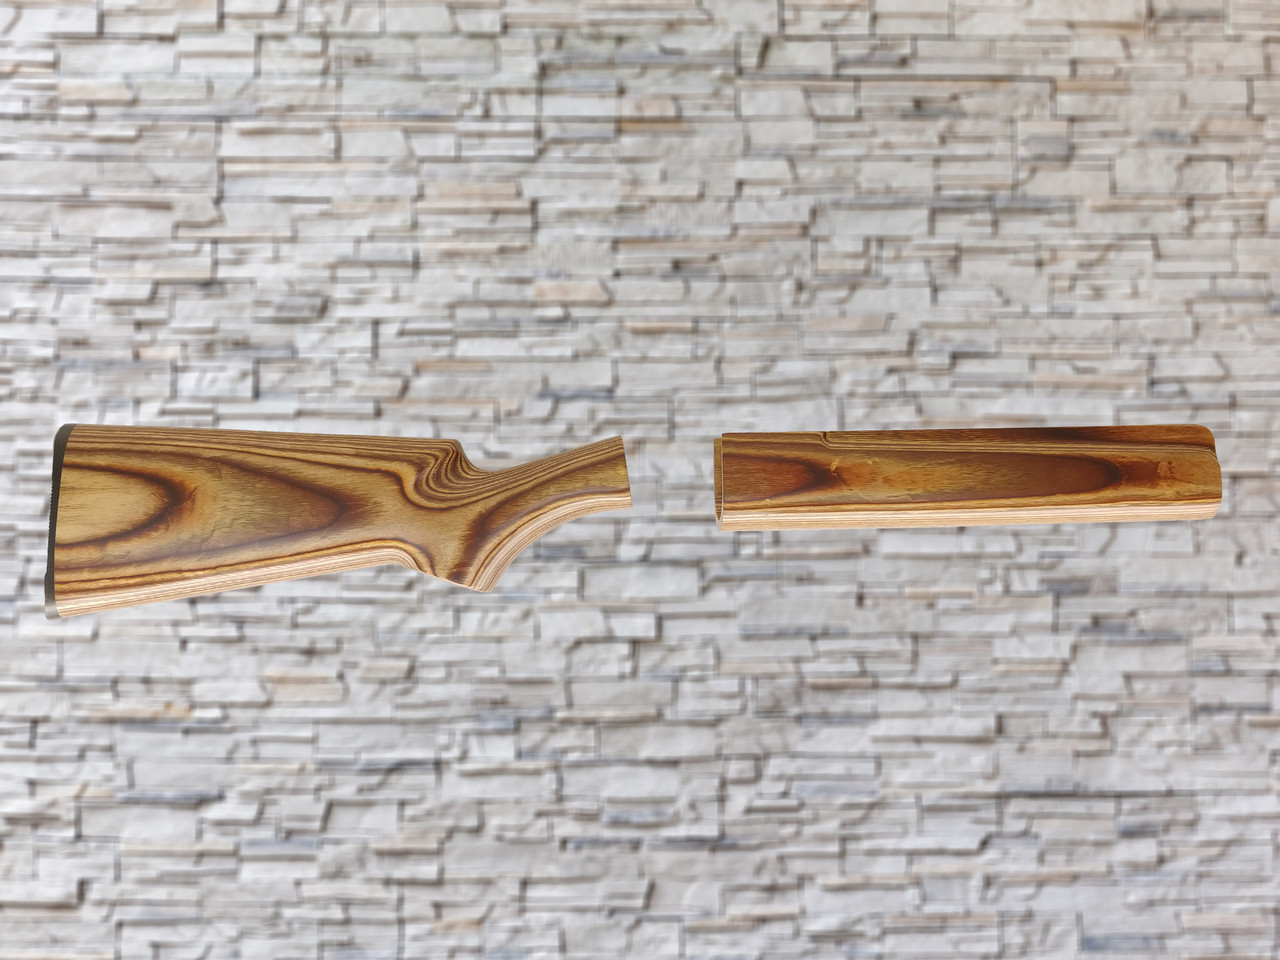 Boyds Field Design Wood Stock Nutmeg for Mossberg 930 12 Gauge Shotguns